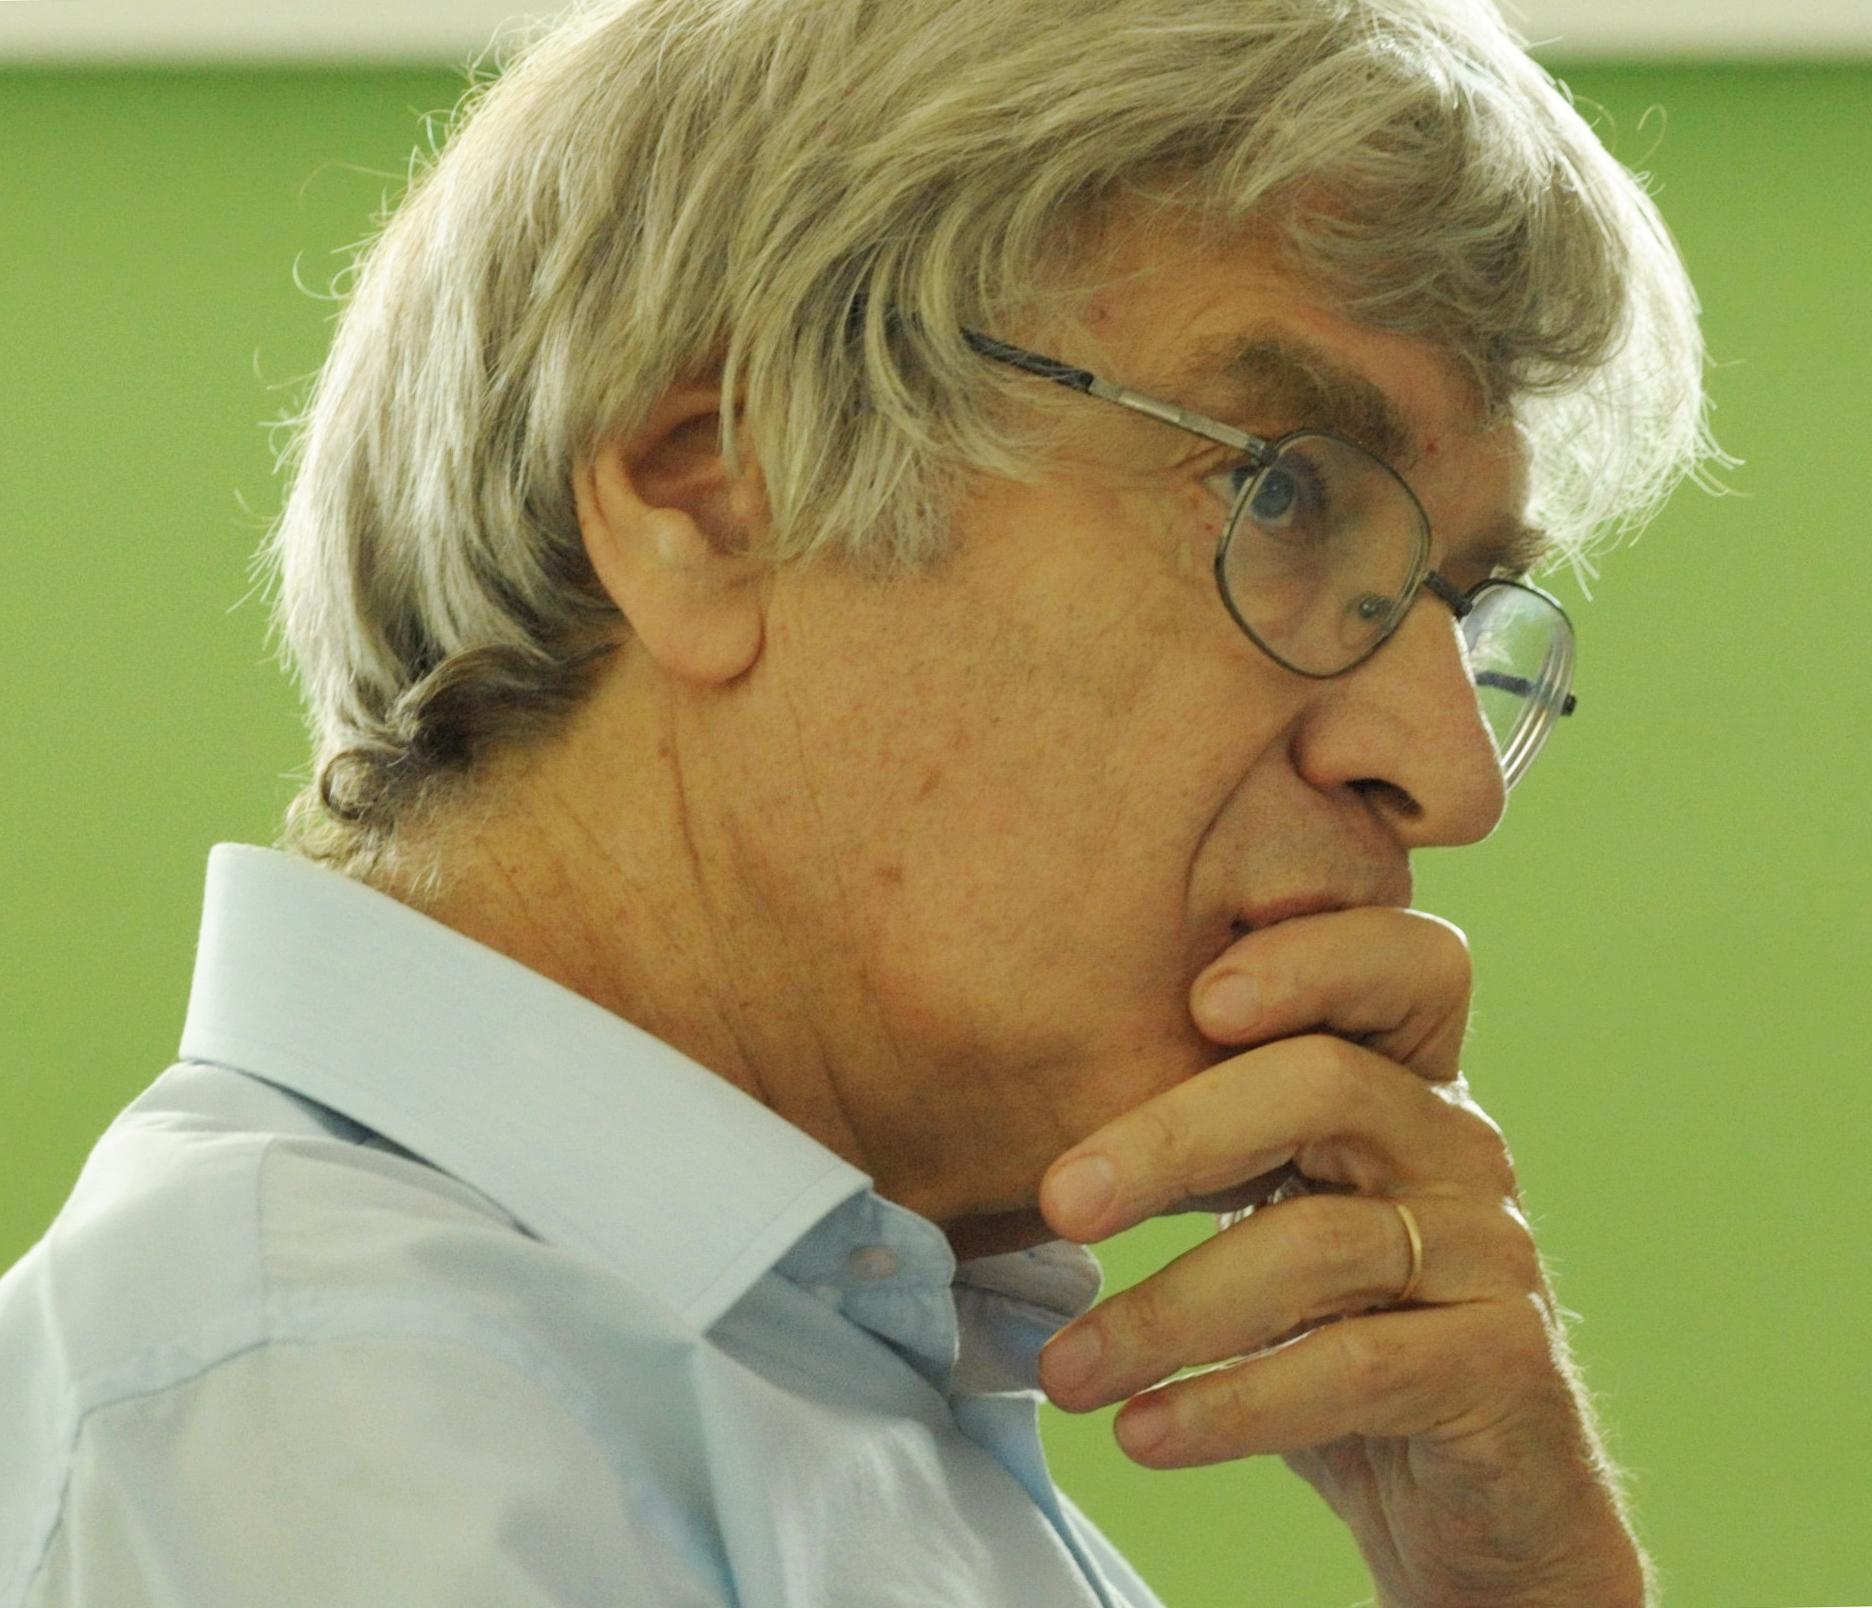 David Heyd è Professore Emerito di Filosofia presso l'Università Ebraica di Gerusalemme